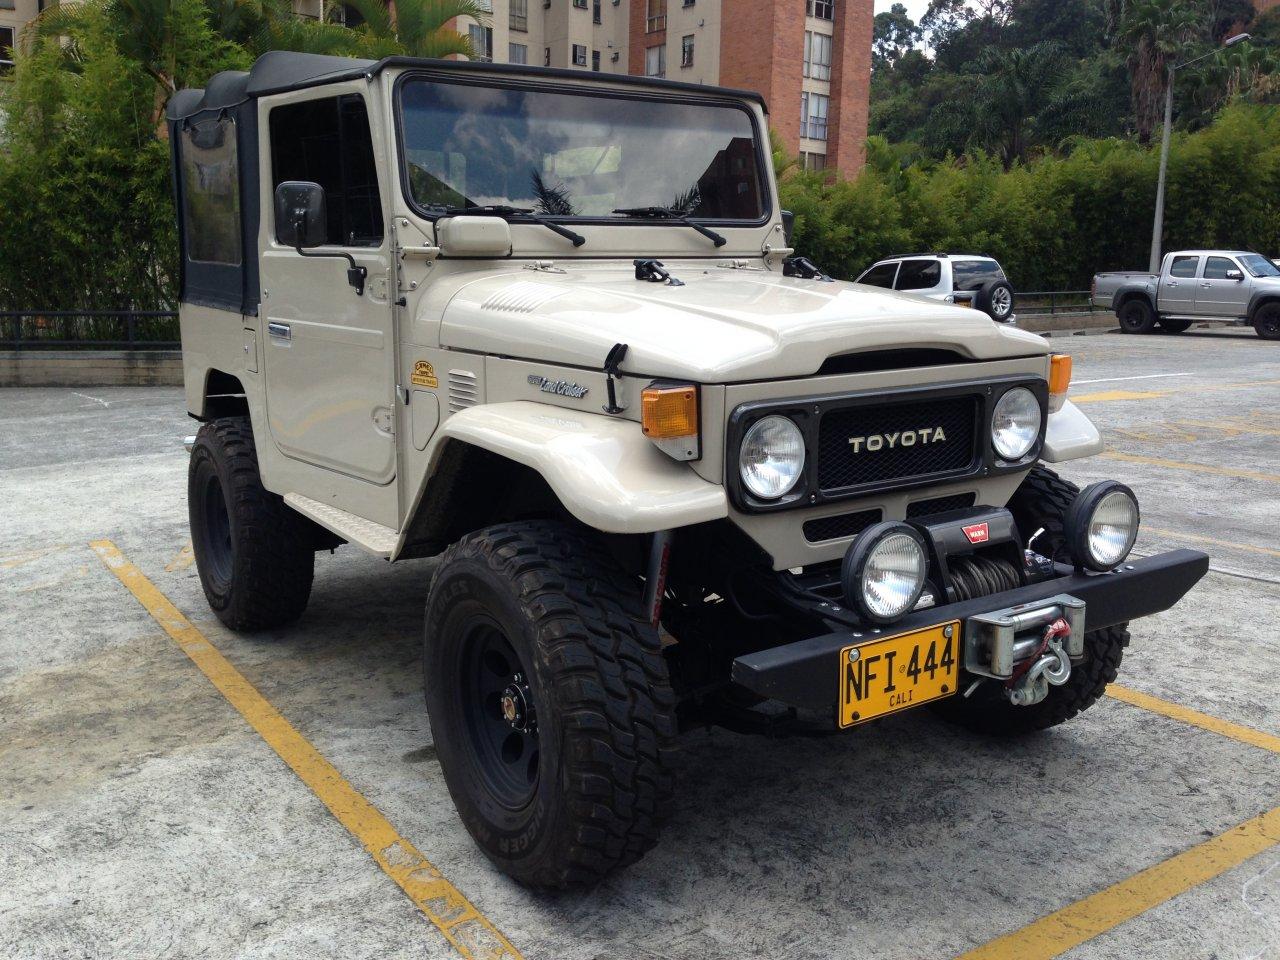 For Sale - 1982 Lifted FJ40 Pacho | IH8MUD Forum